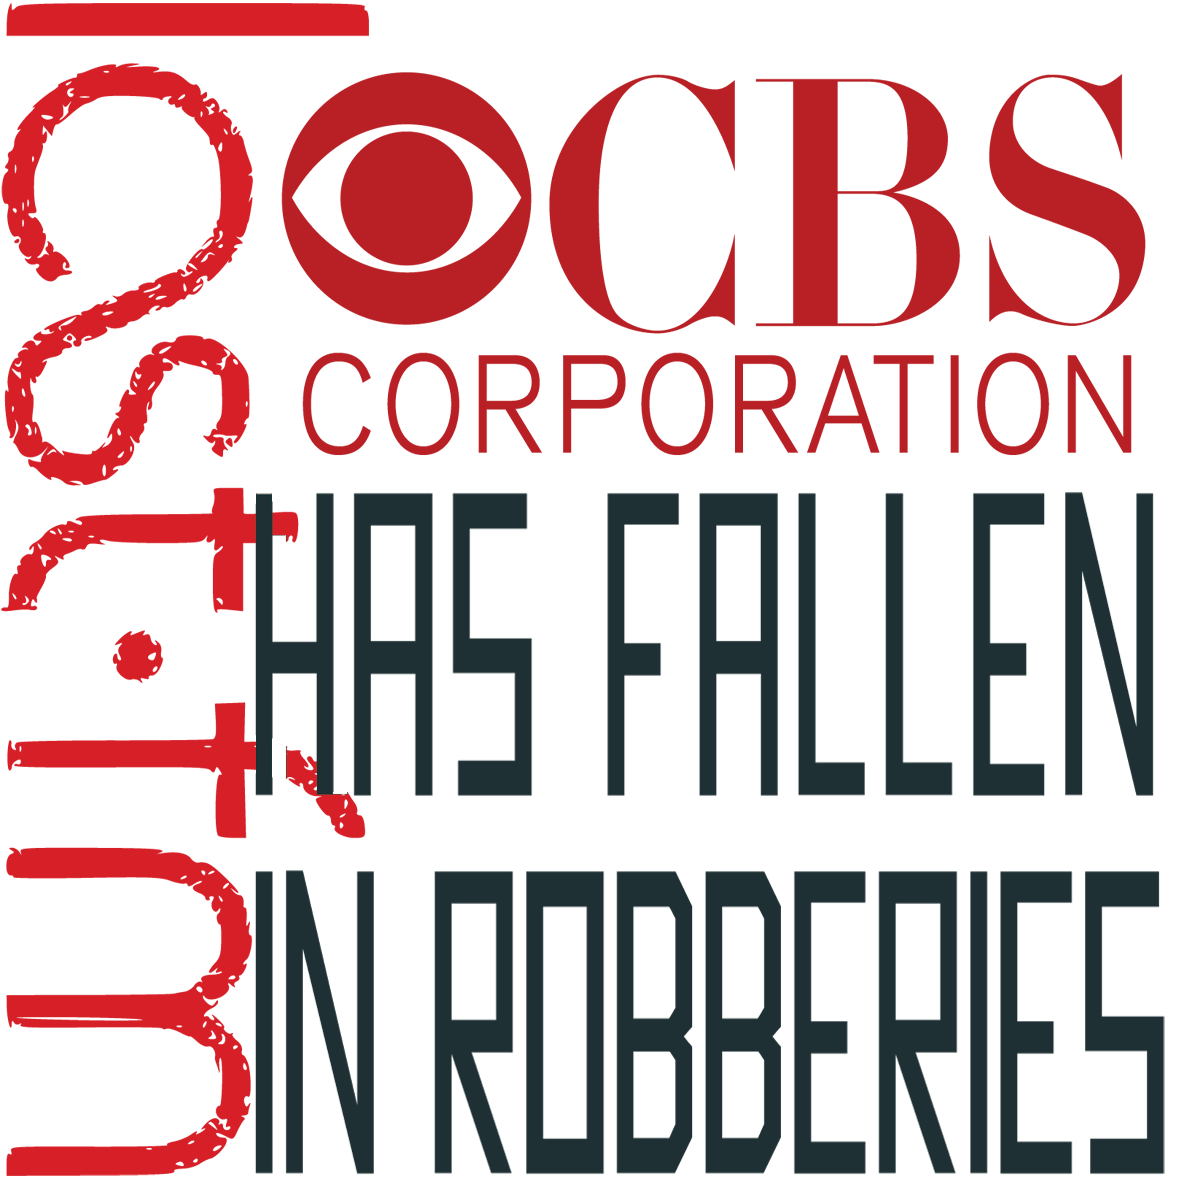 Last Fm With CBS Has Fallen In Robberies